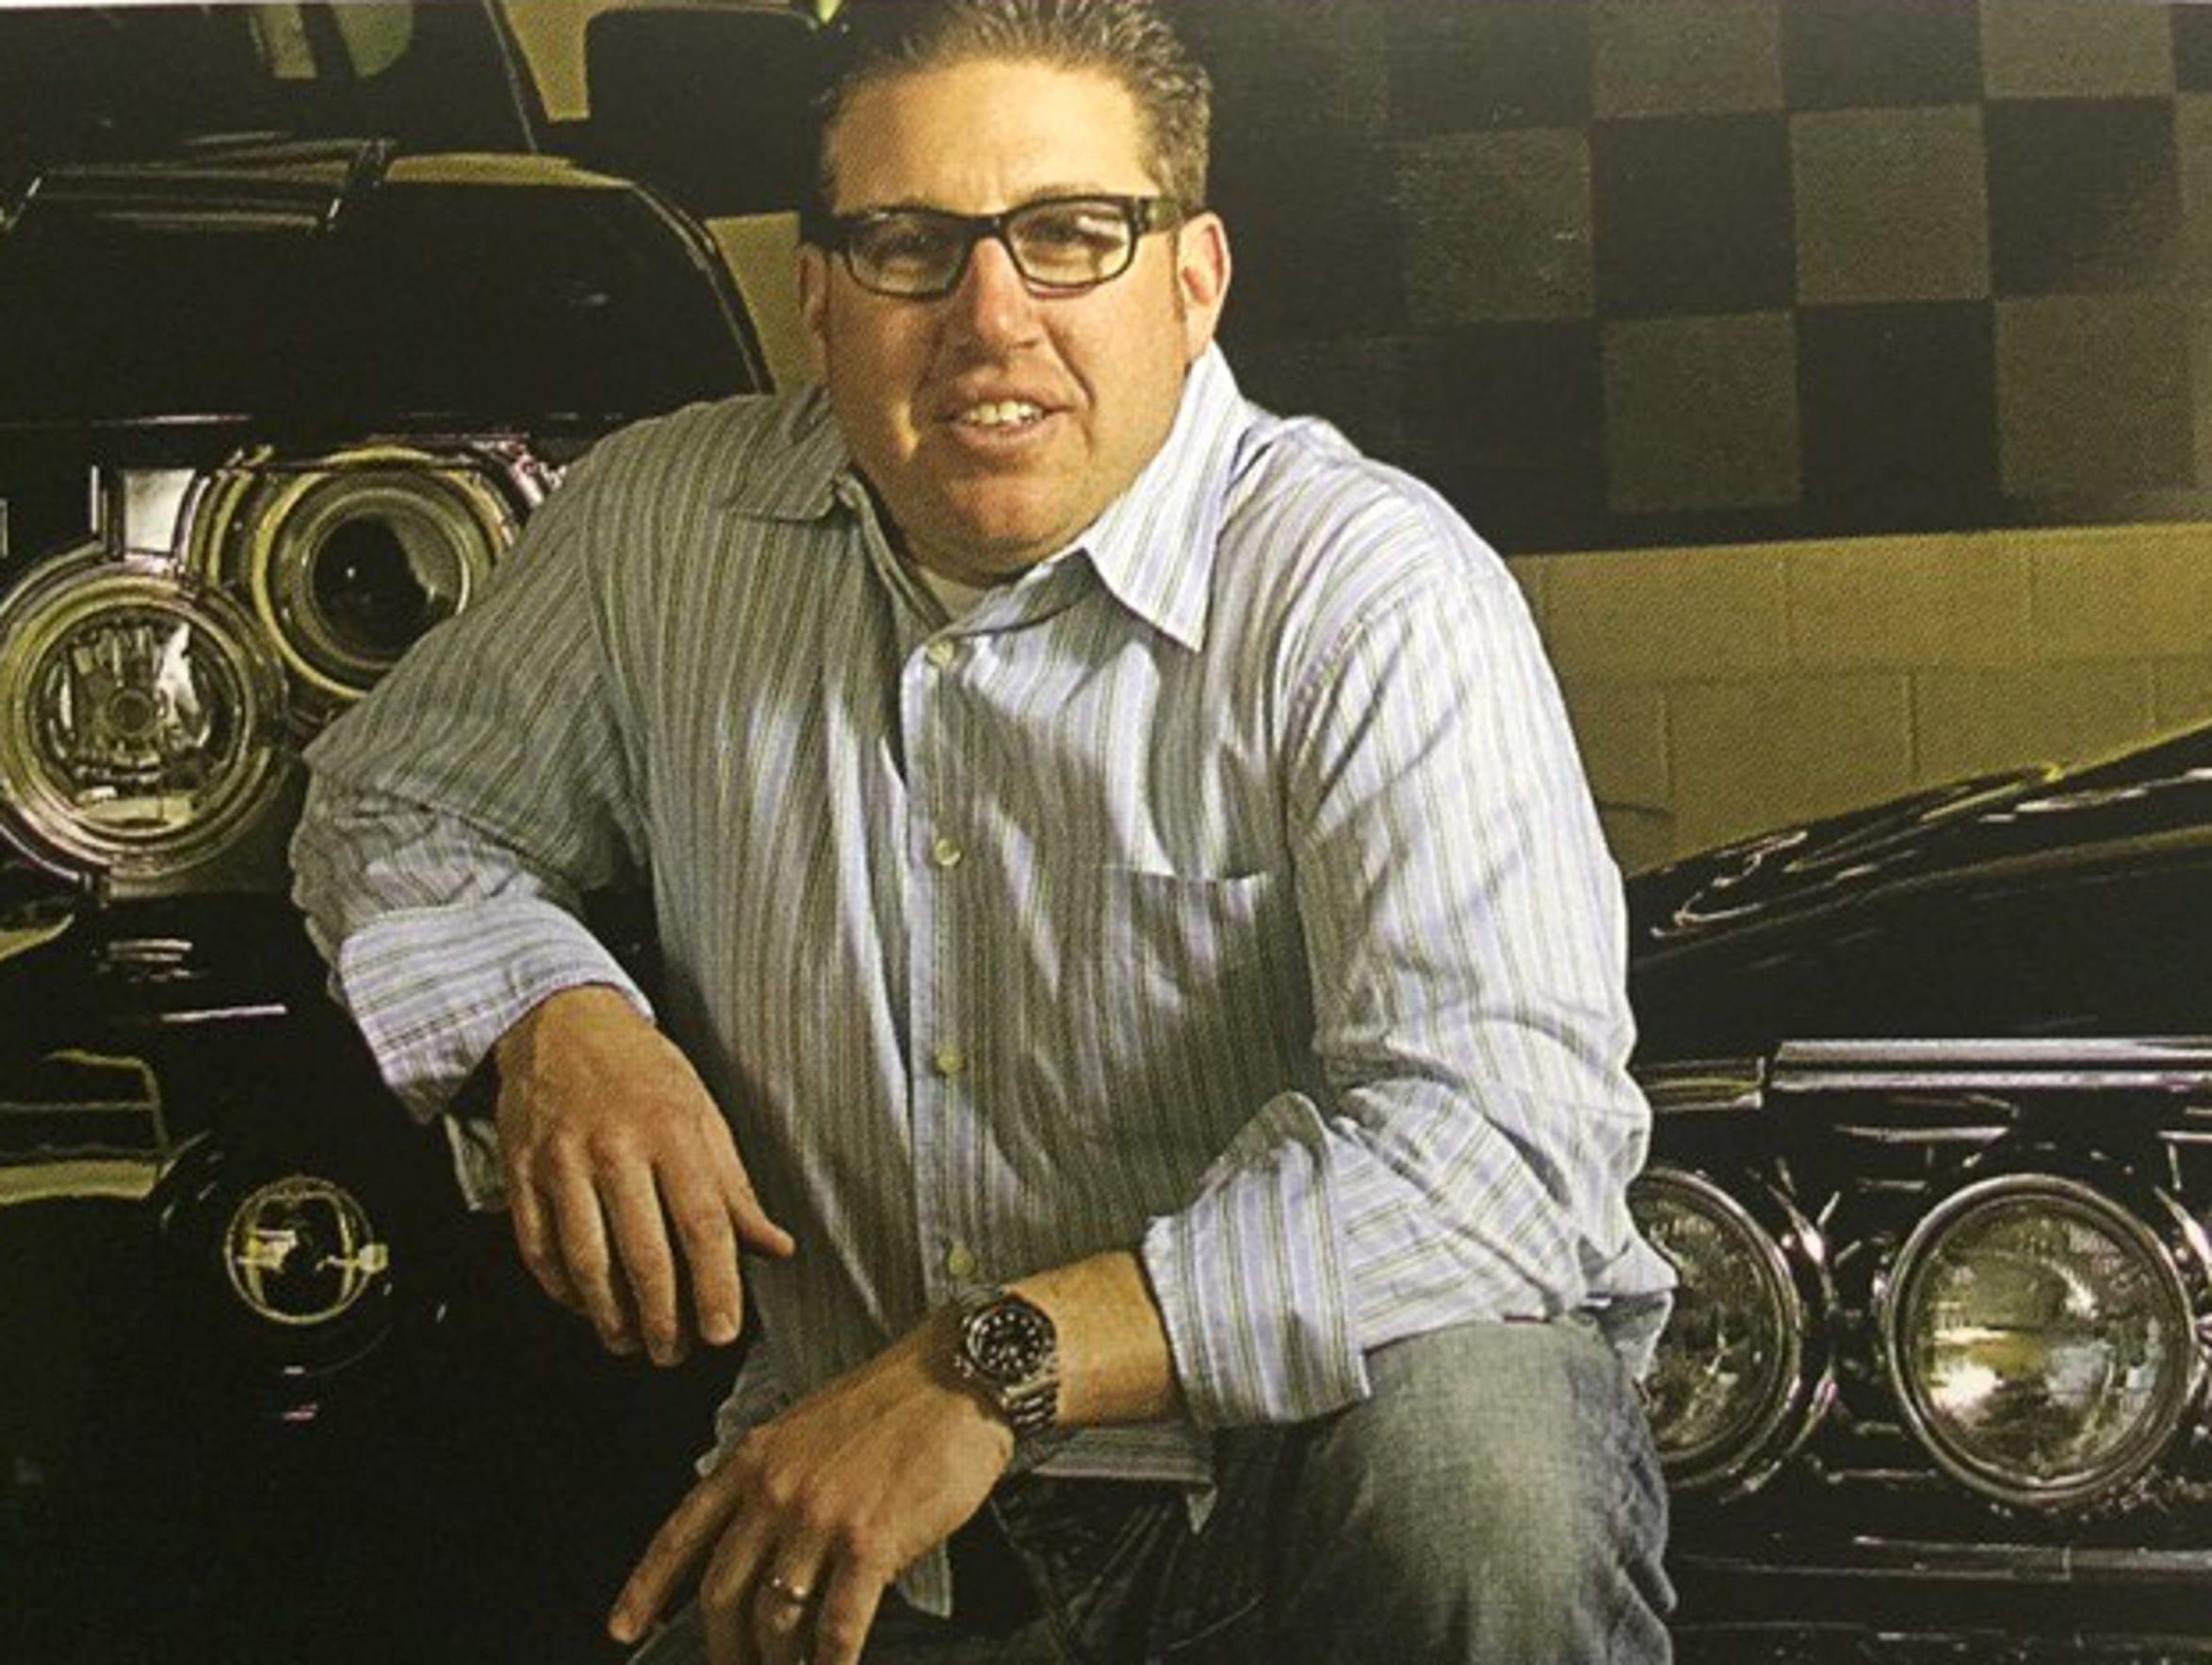 Marc Stromvig, owner of M Car Co. in Oregon, was involved